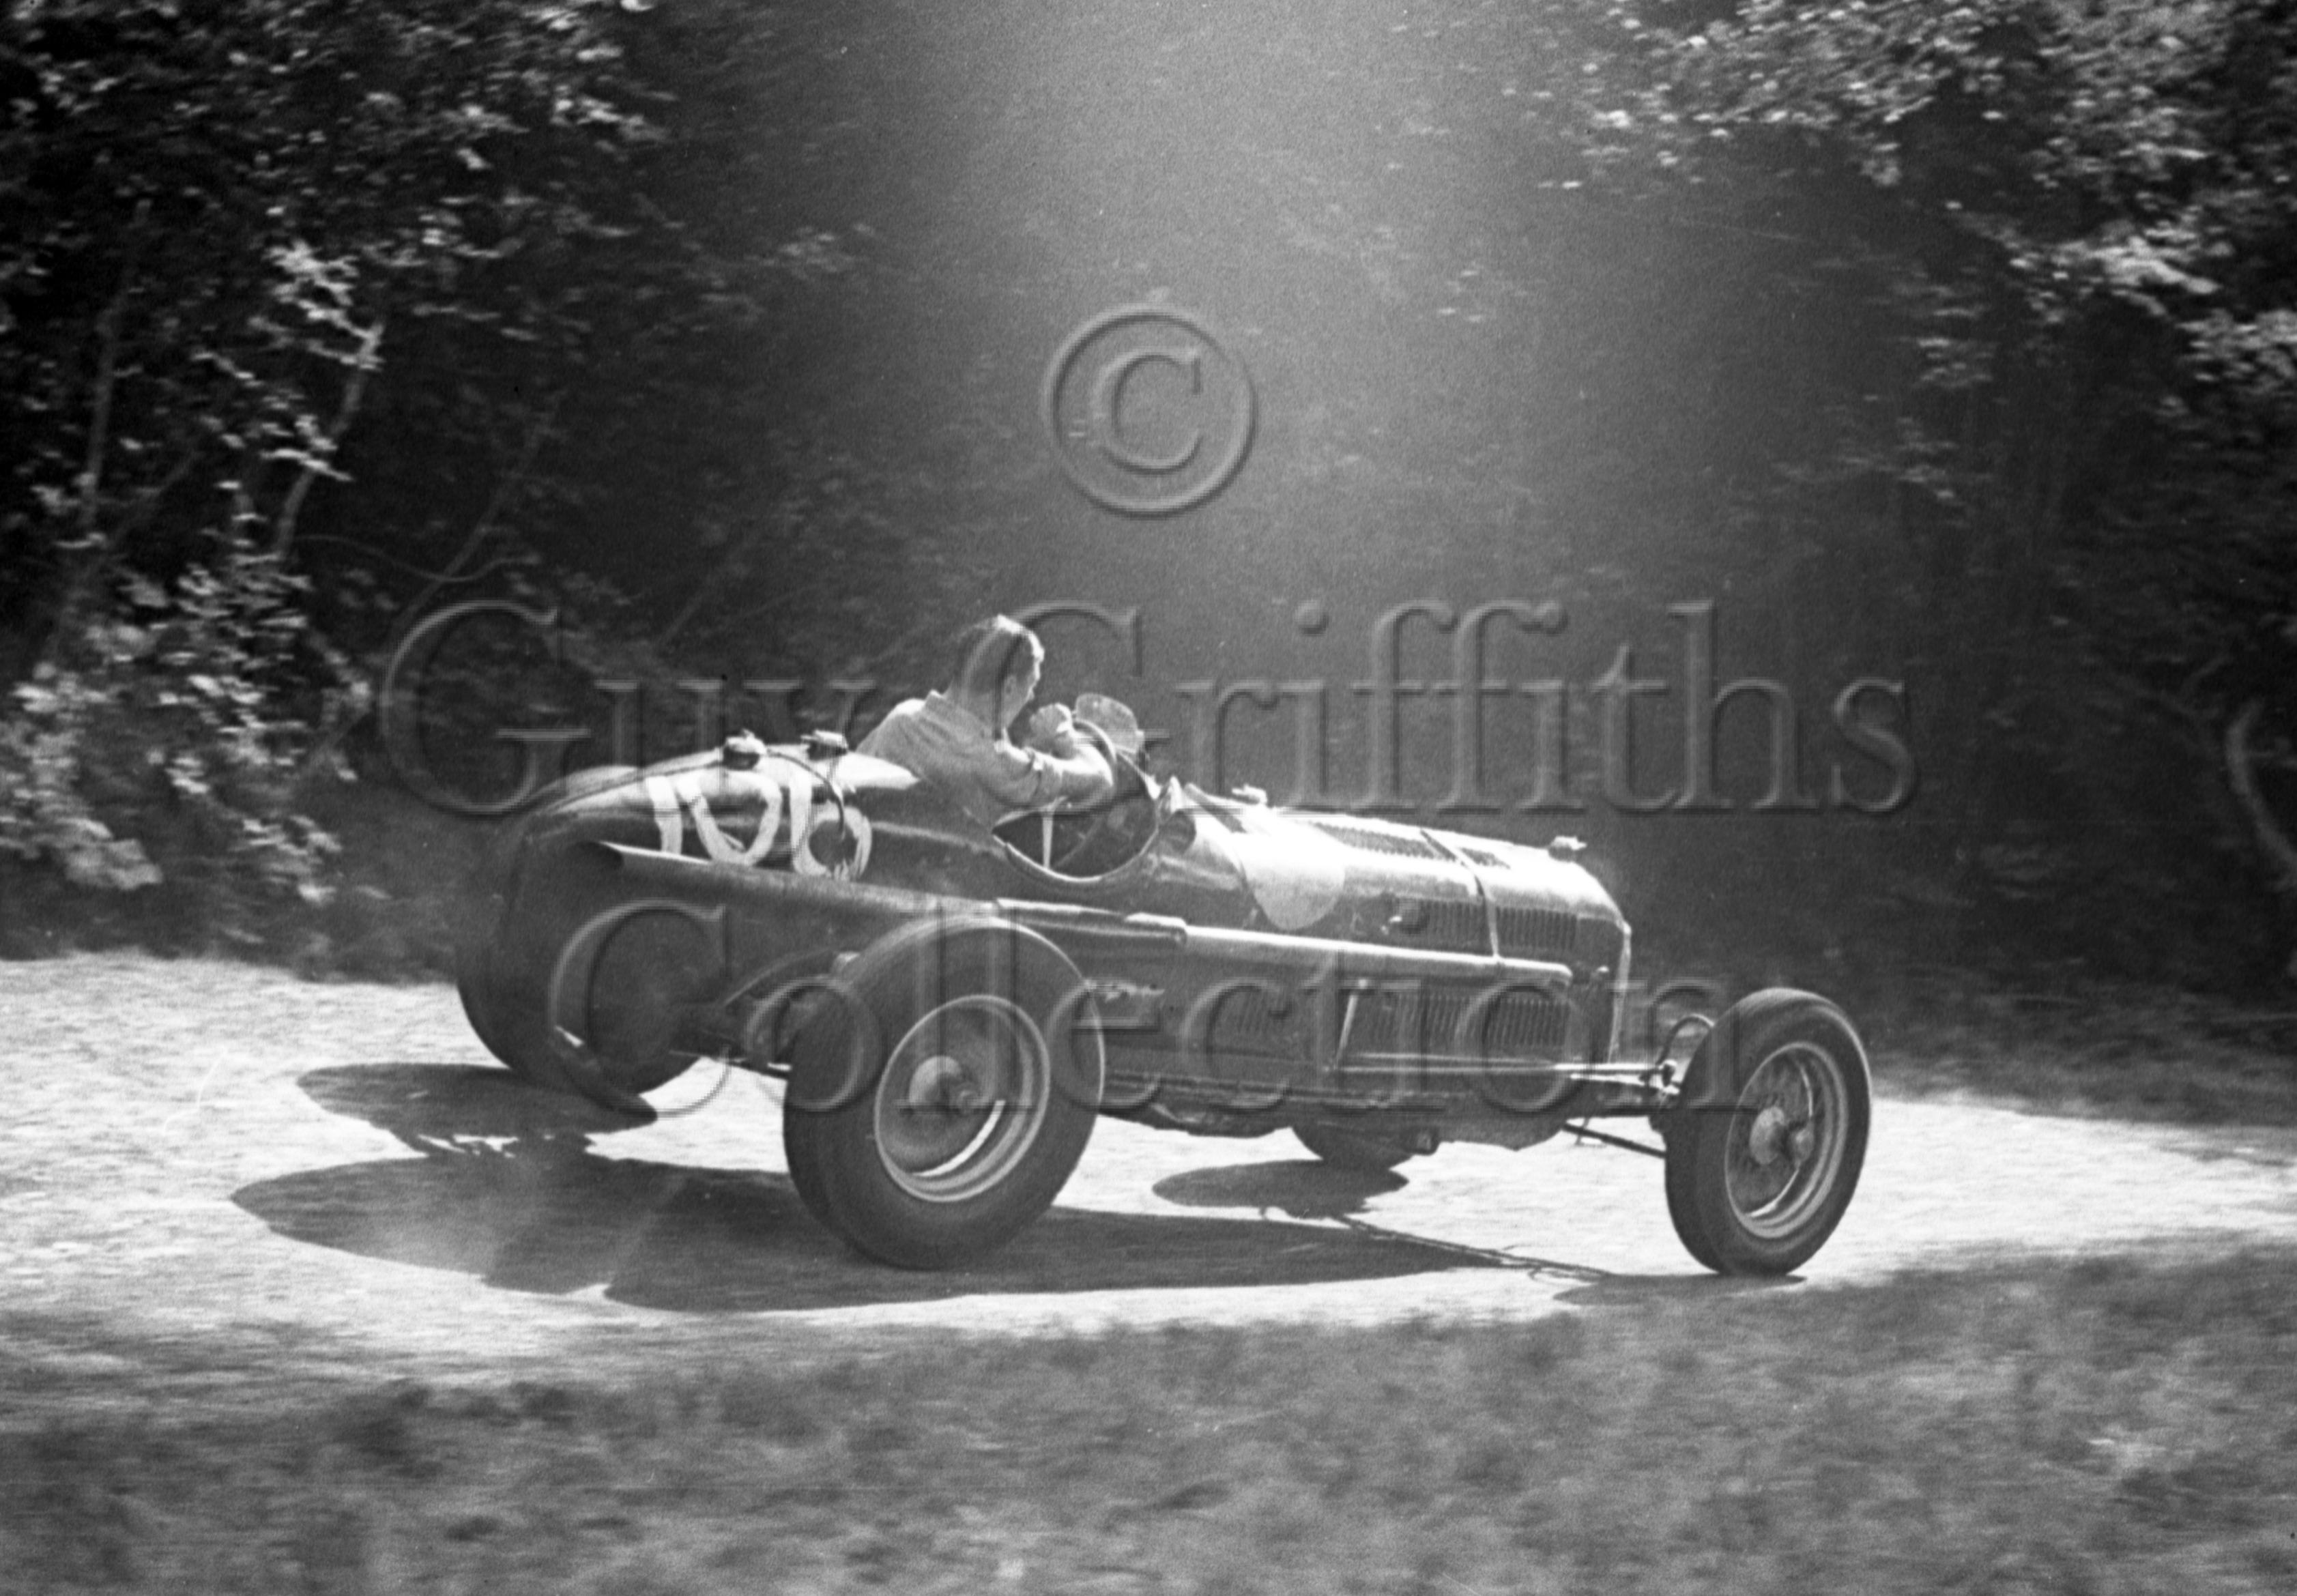 05-512–R-Salvadori–Alfa-Romeo–Great-Auclum–26-07-1947.jpg - Guy Griffiths Collection